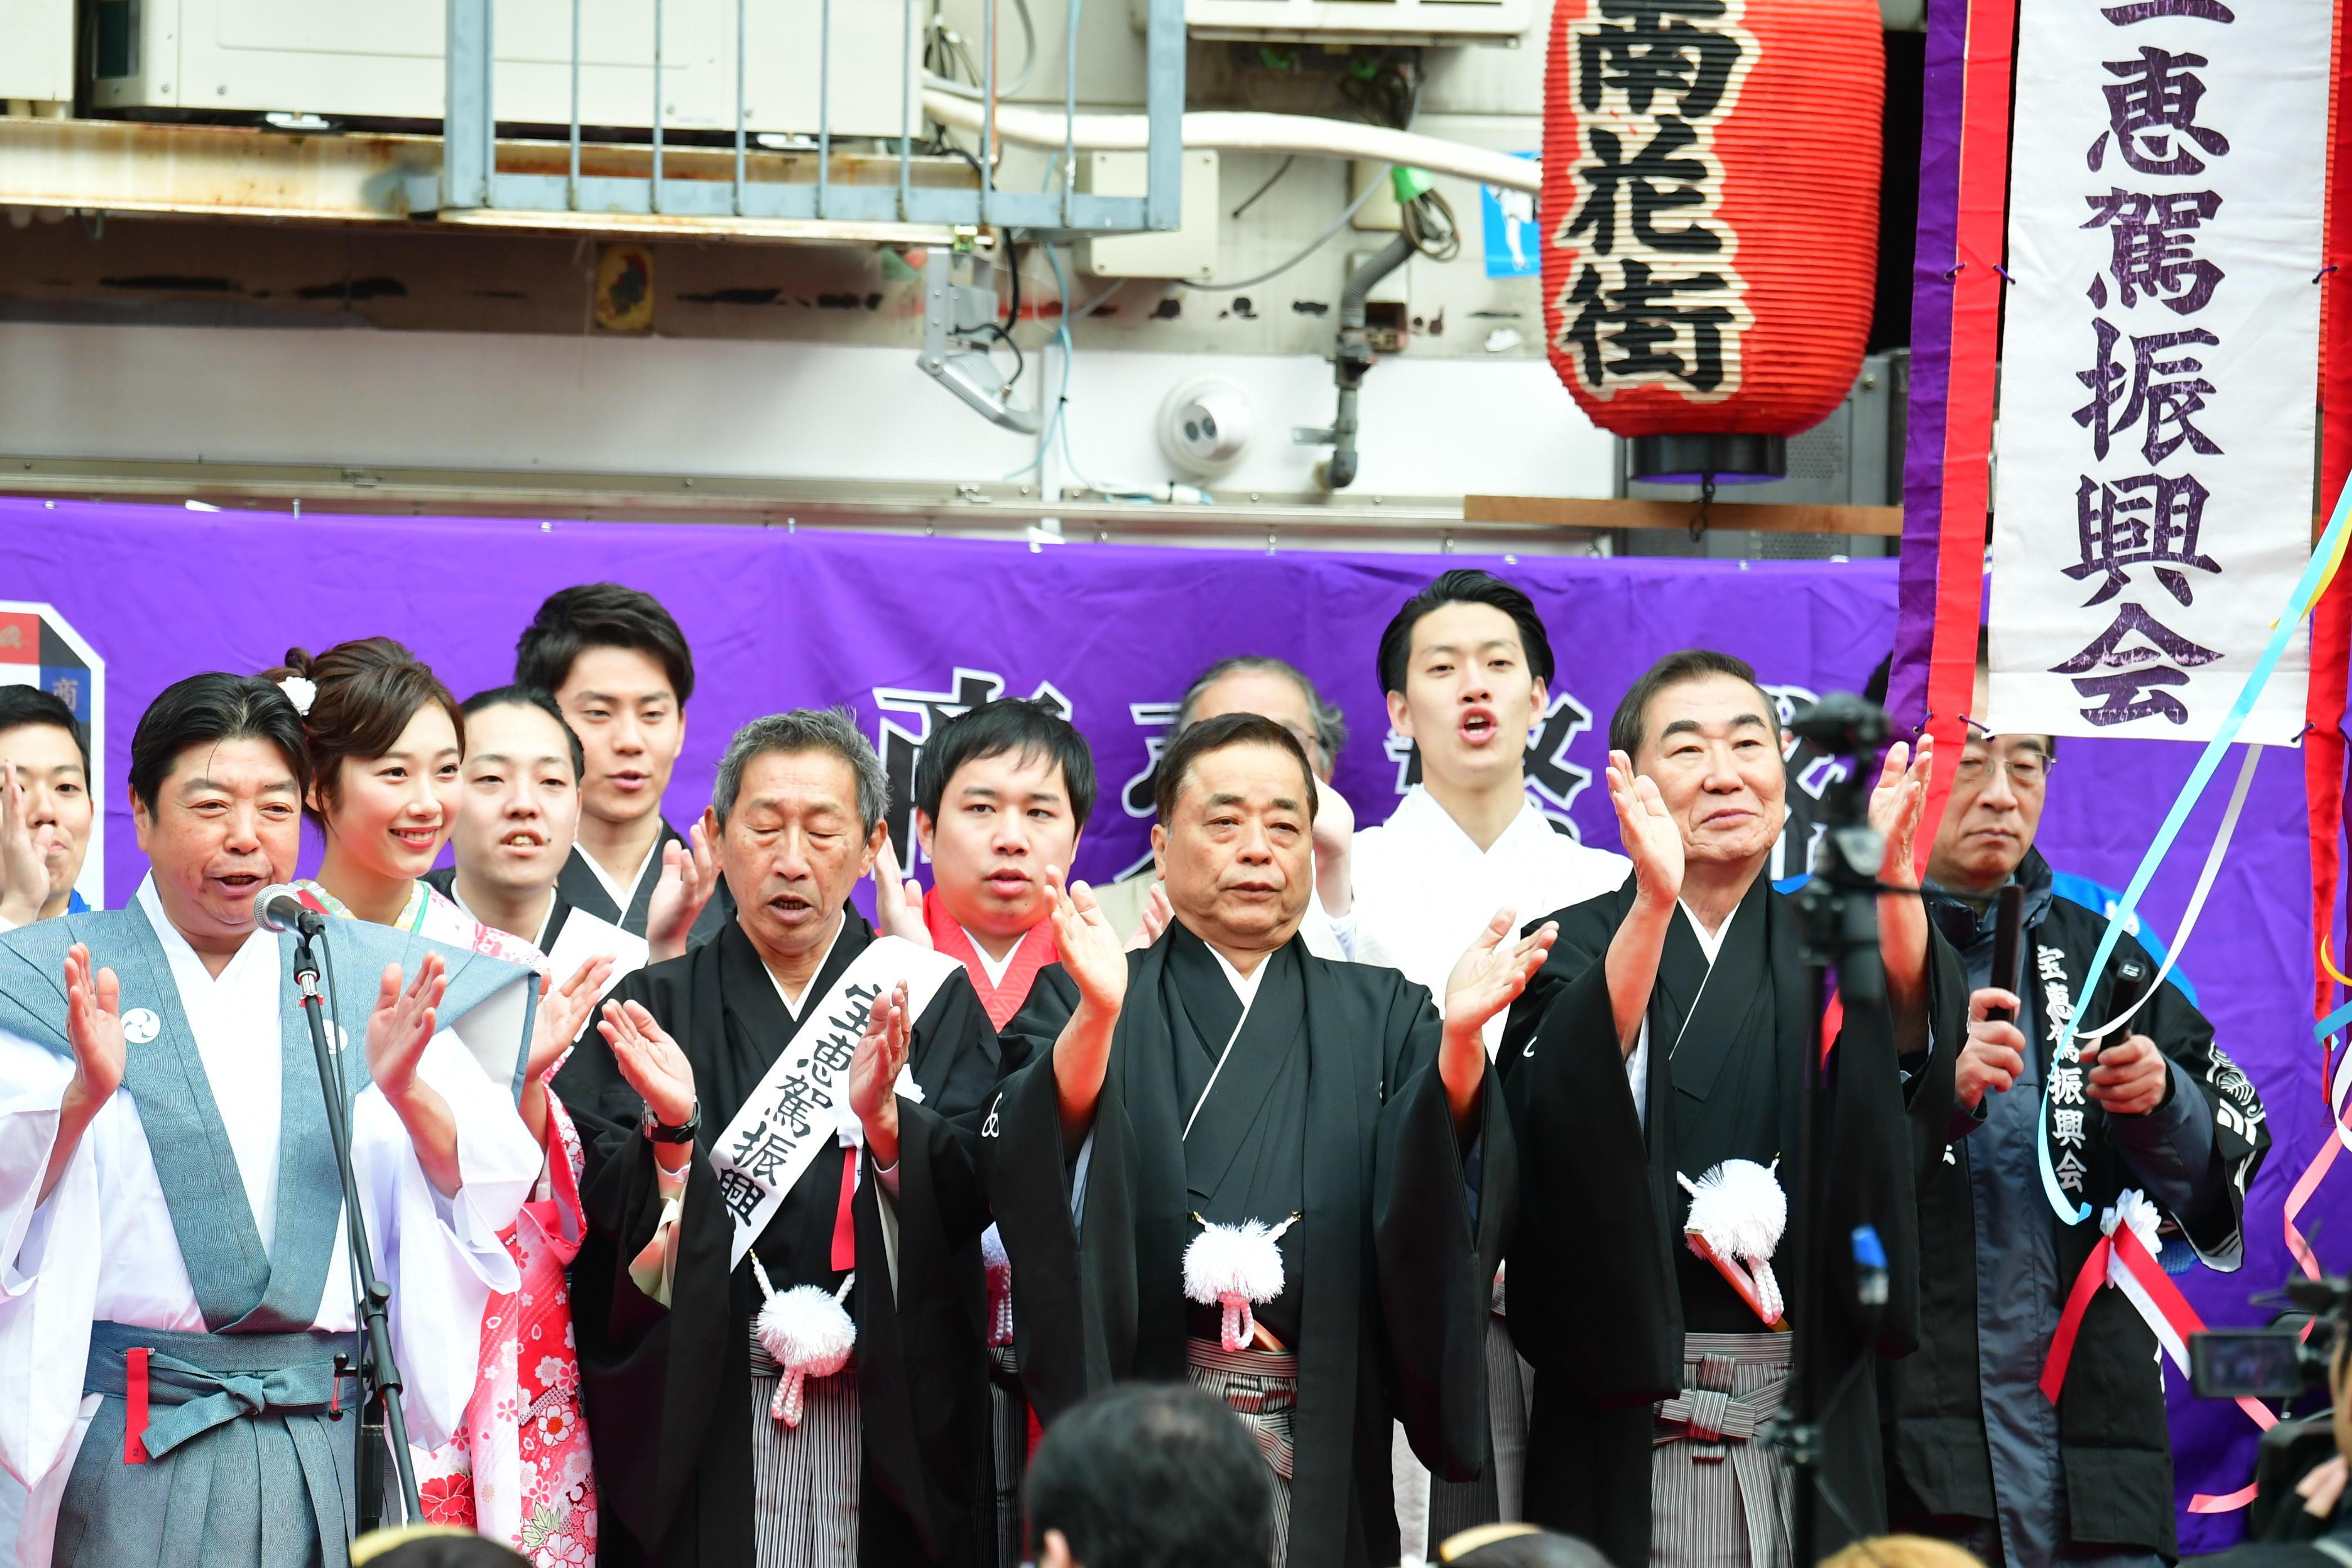 http://news.yoshimoto.co.jp/20190110195139-de5ecdae9882a3be4f4a07ea7fbadaaebfee8a27.jpg